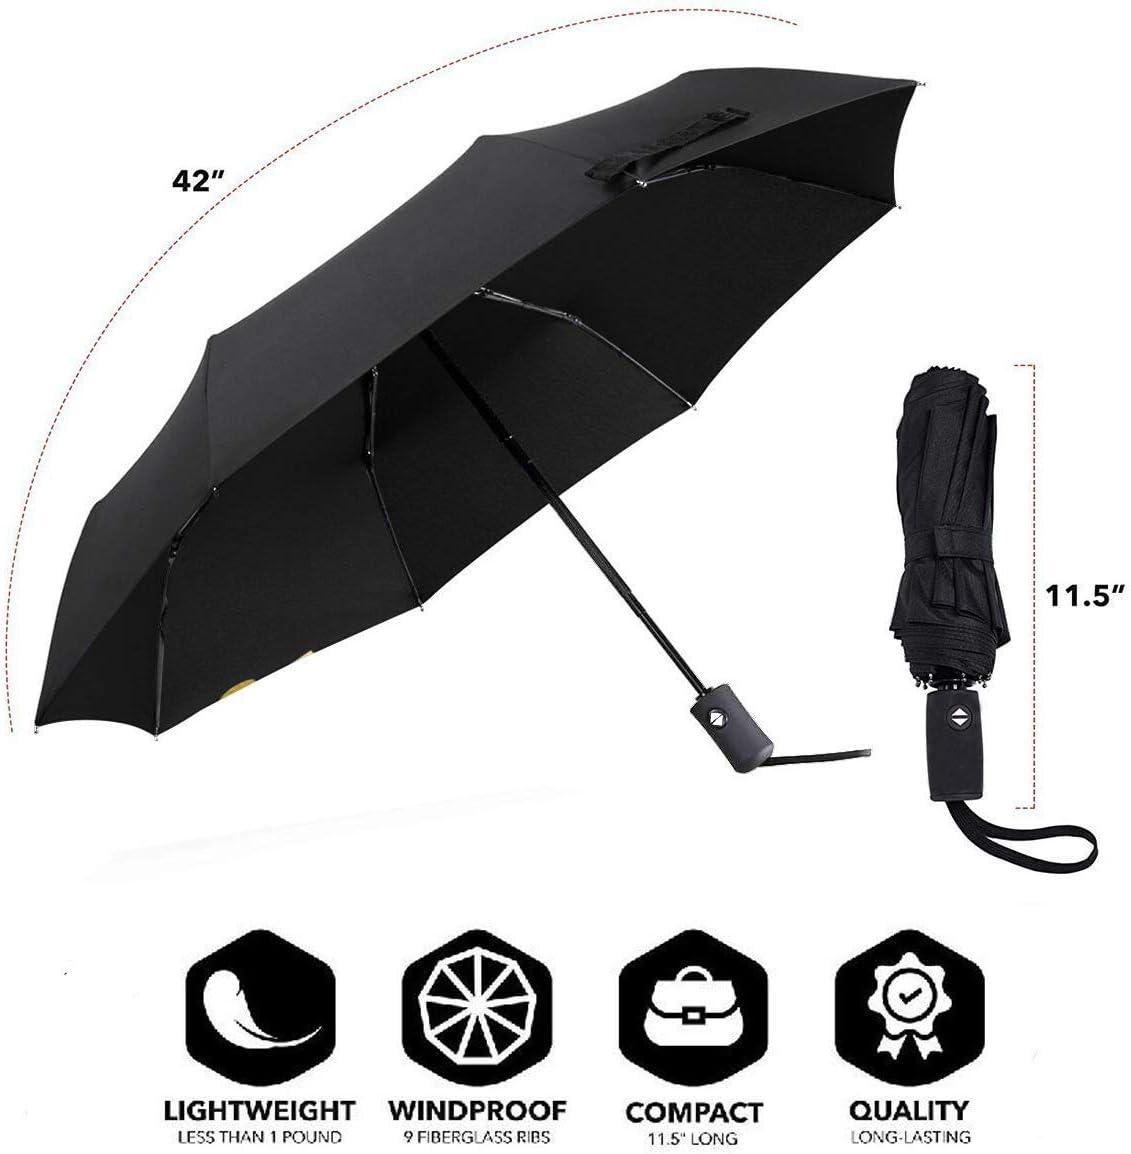 Aven-Gers G-AME Compact Auto Open Close Folding Business Umbrellas UV Protection Automatic Tri-fold Umbrella for Men and Women Lovesofun Portable Automatic Umbrella